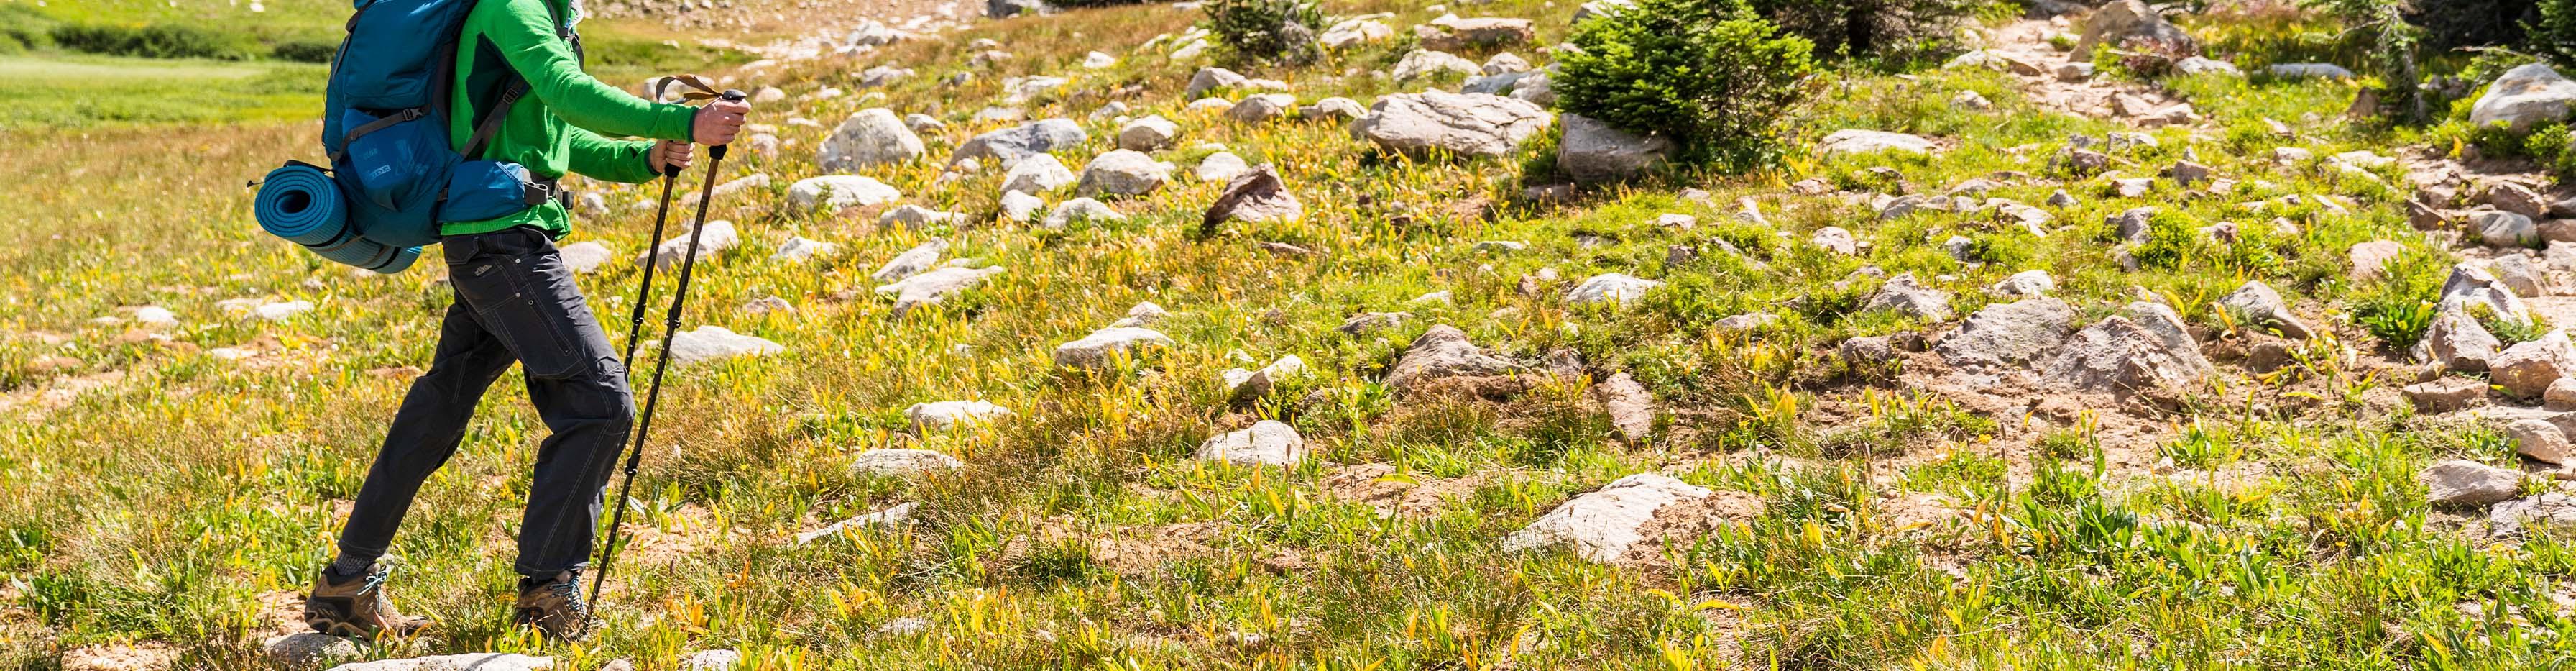 kelty-trekking-poles-landing-page-image.jpg